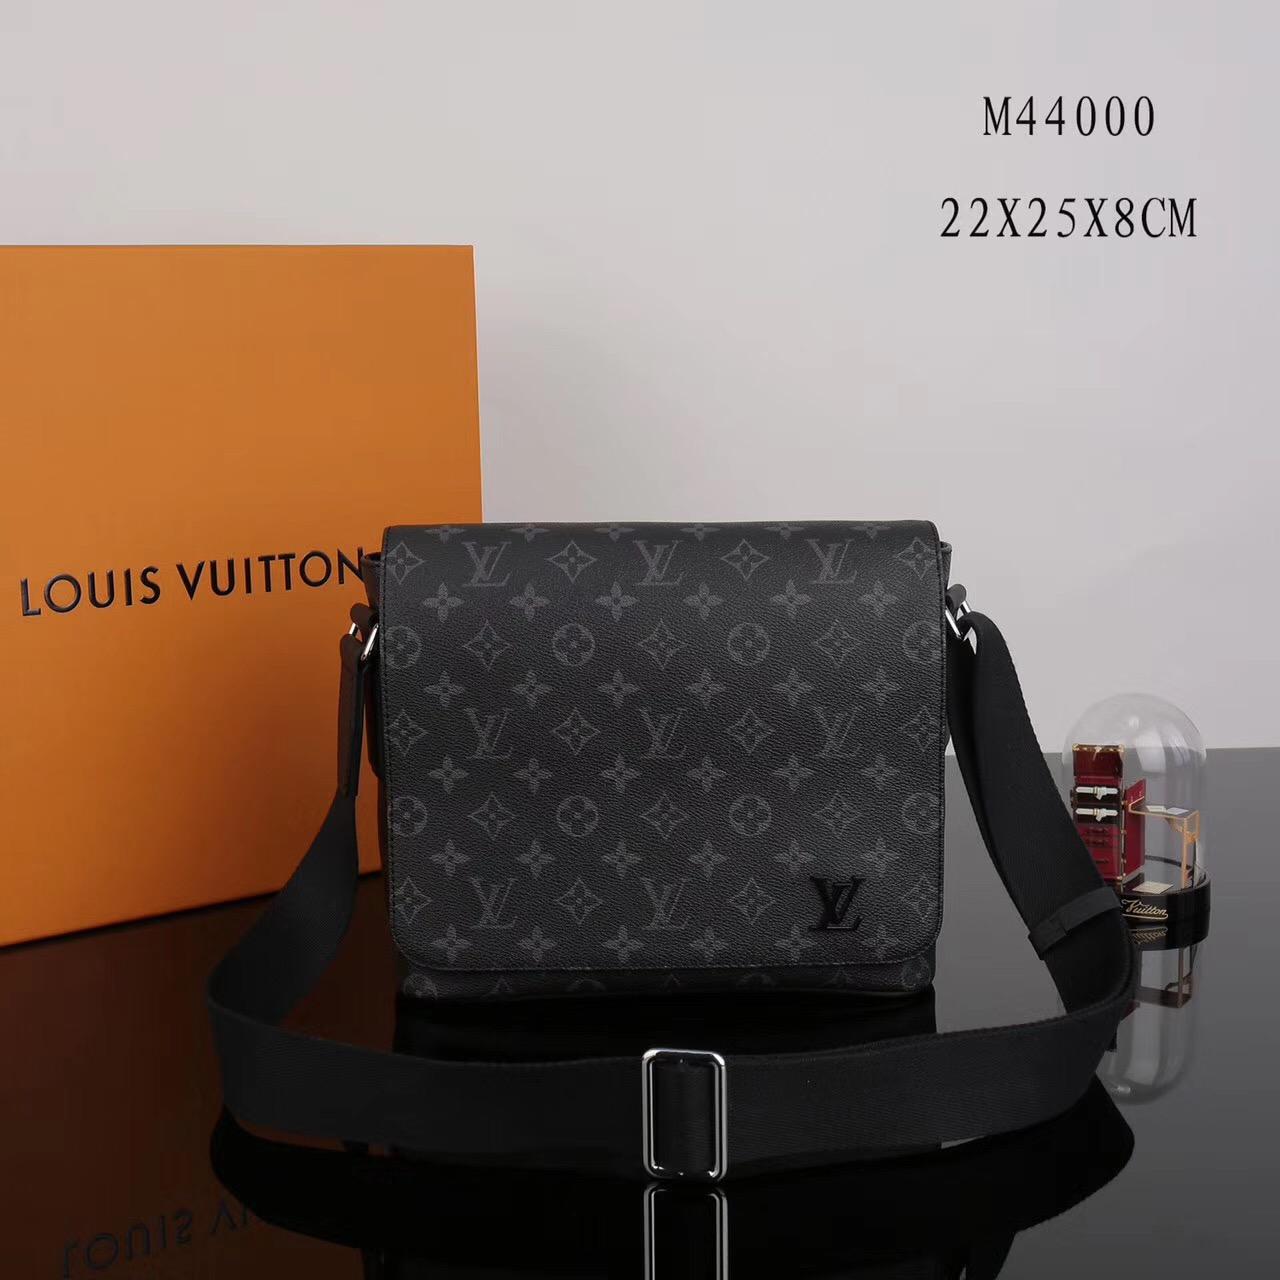 4bd77c297abf2 Men LV Louis Vuitton M44000 District Monogram Messenger bags Handbags Gray  ...